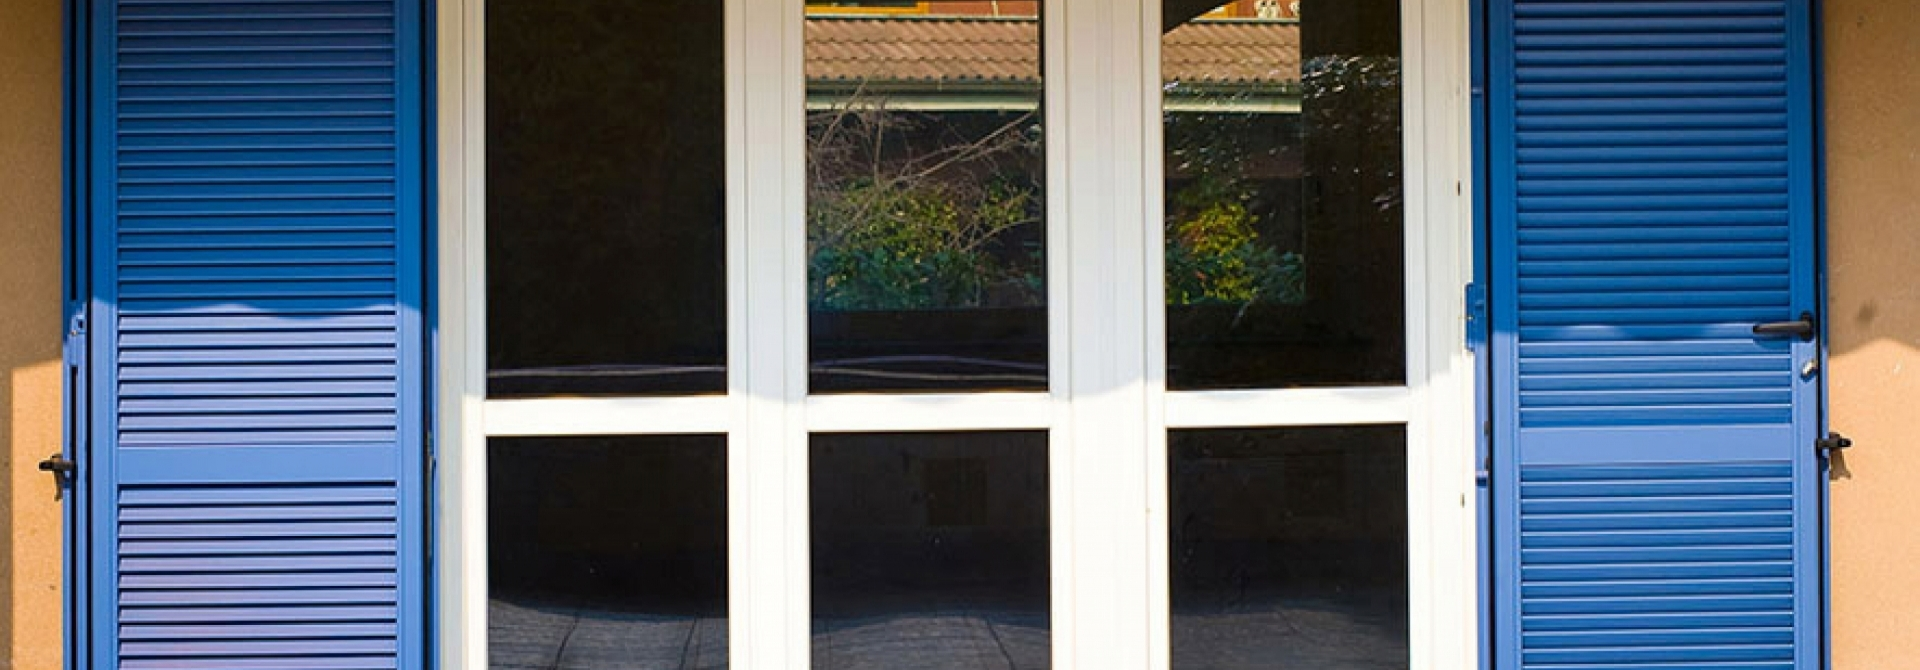 Infissi bologna finestre porte serramenti bologna - Porte e finestre pvc ...